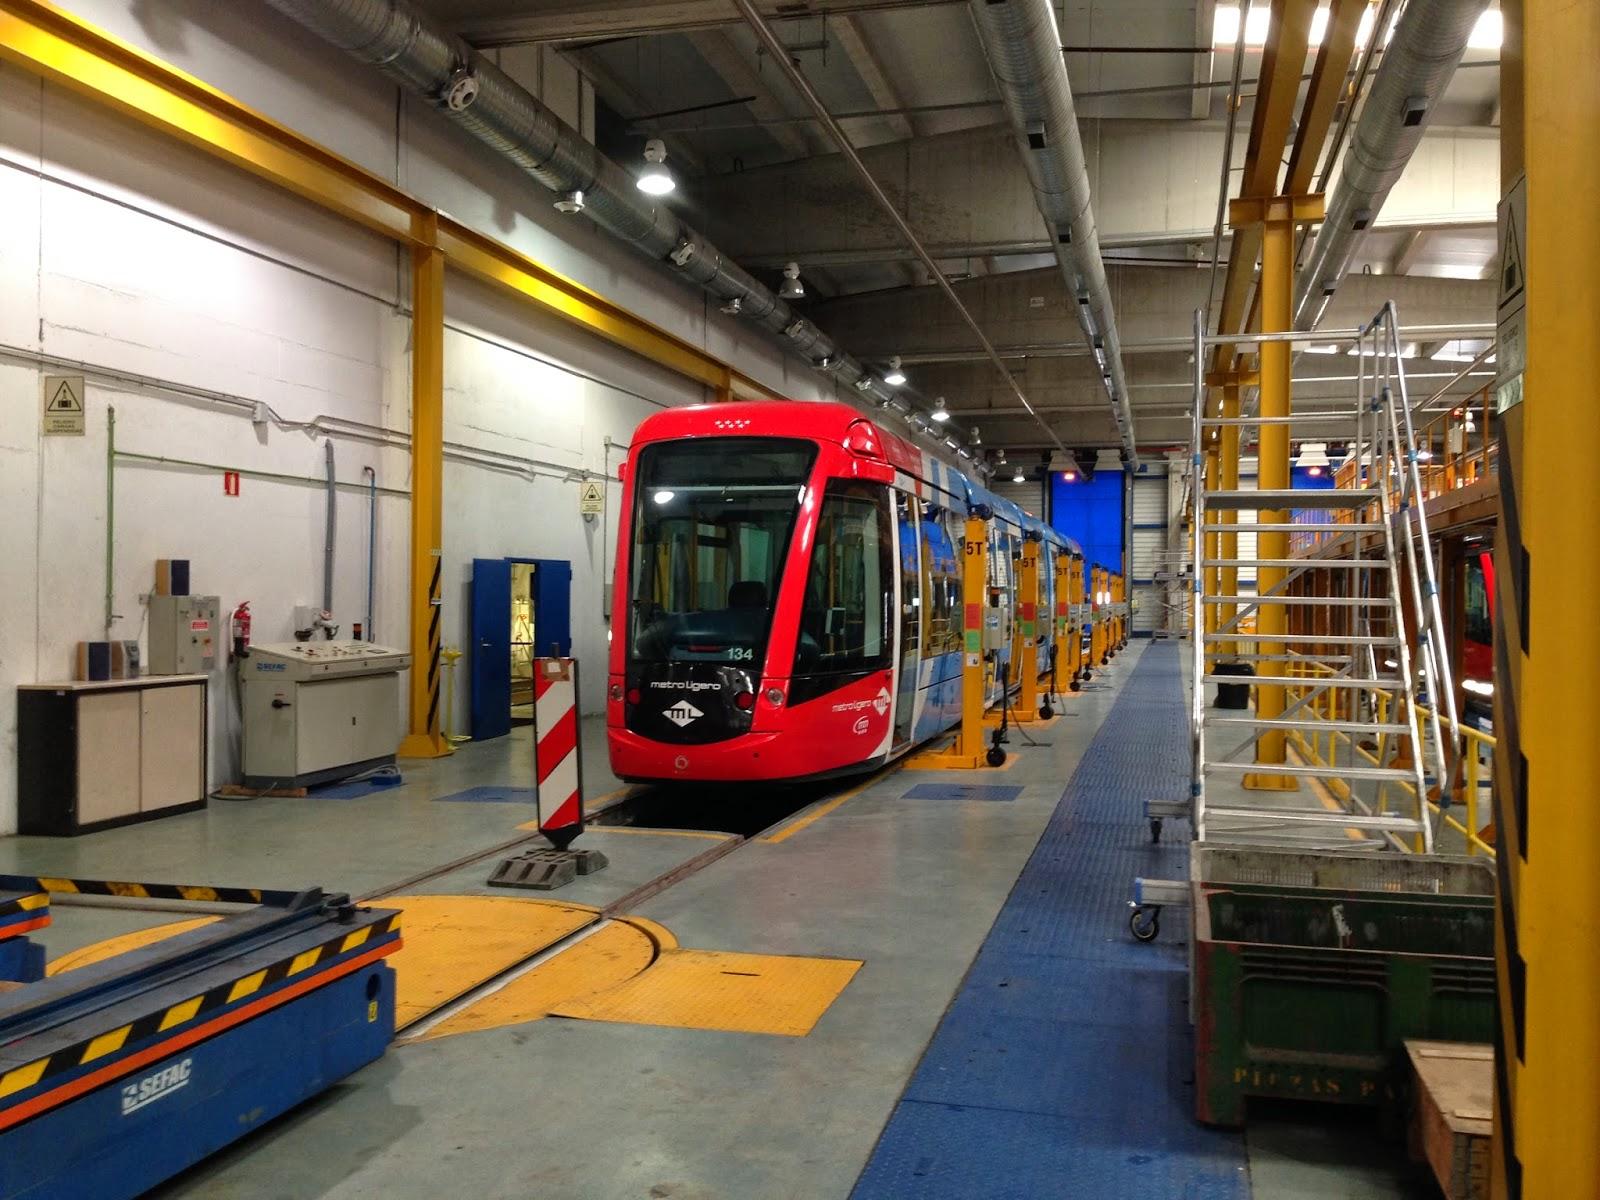 Madrid Ferrocarriles y Transportes Urbanos Lnea ML1 Metro